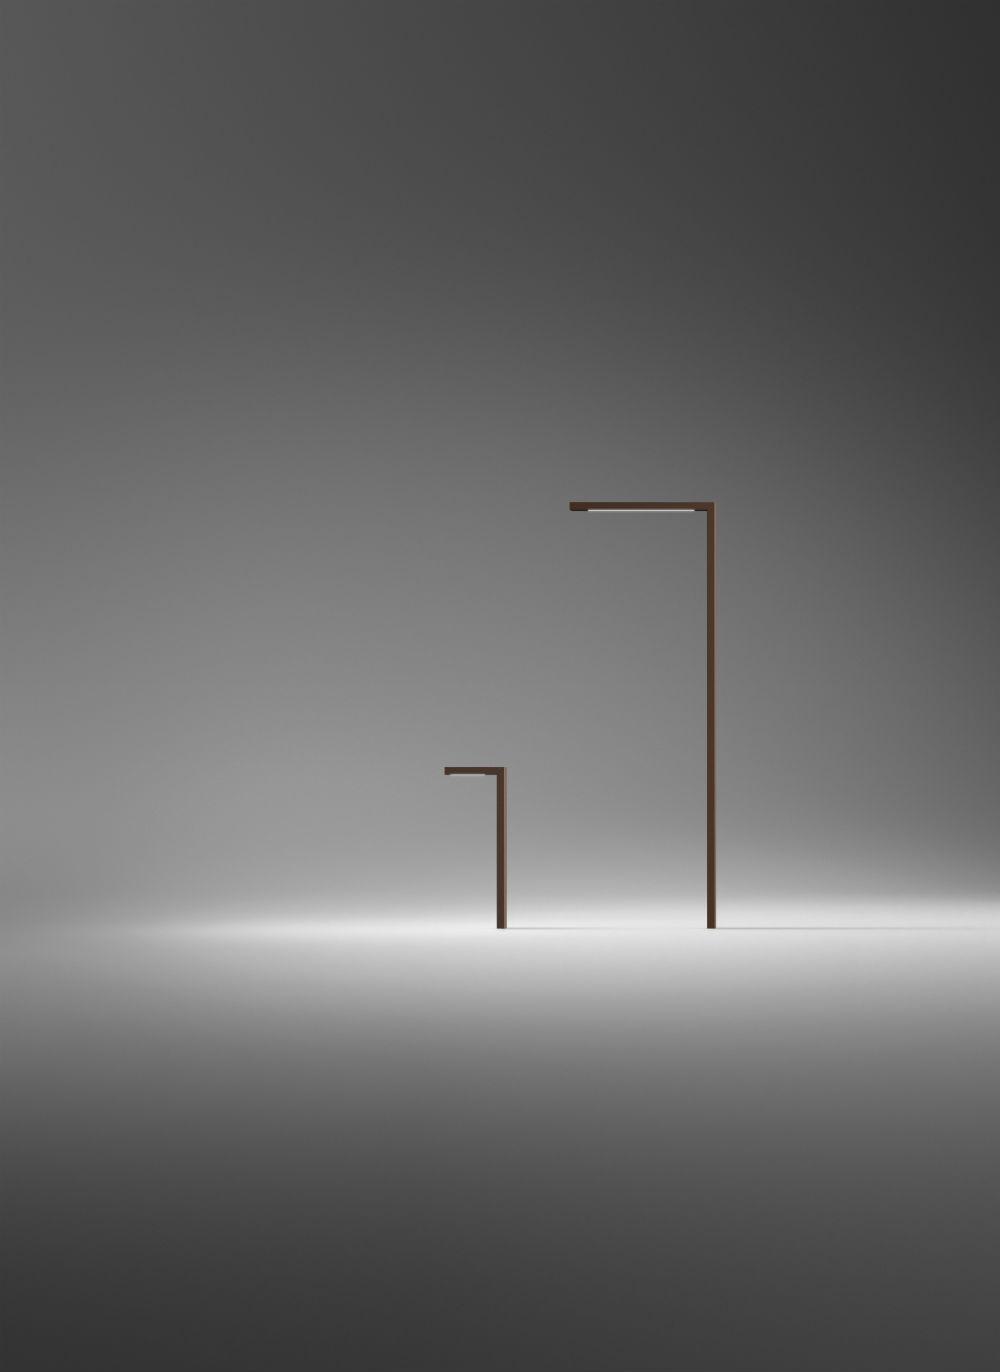 vibia courb lev lampadaire angulo recto 4515 07. Black Bedroom Furniture Sets. Home Design Ideas